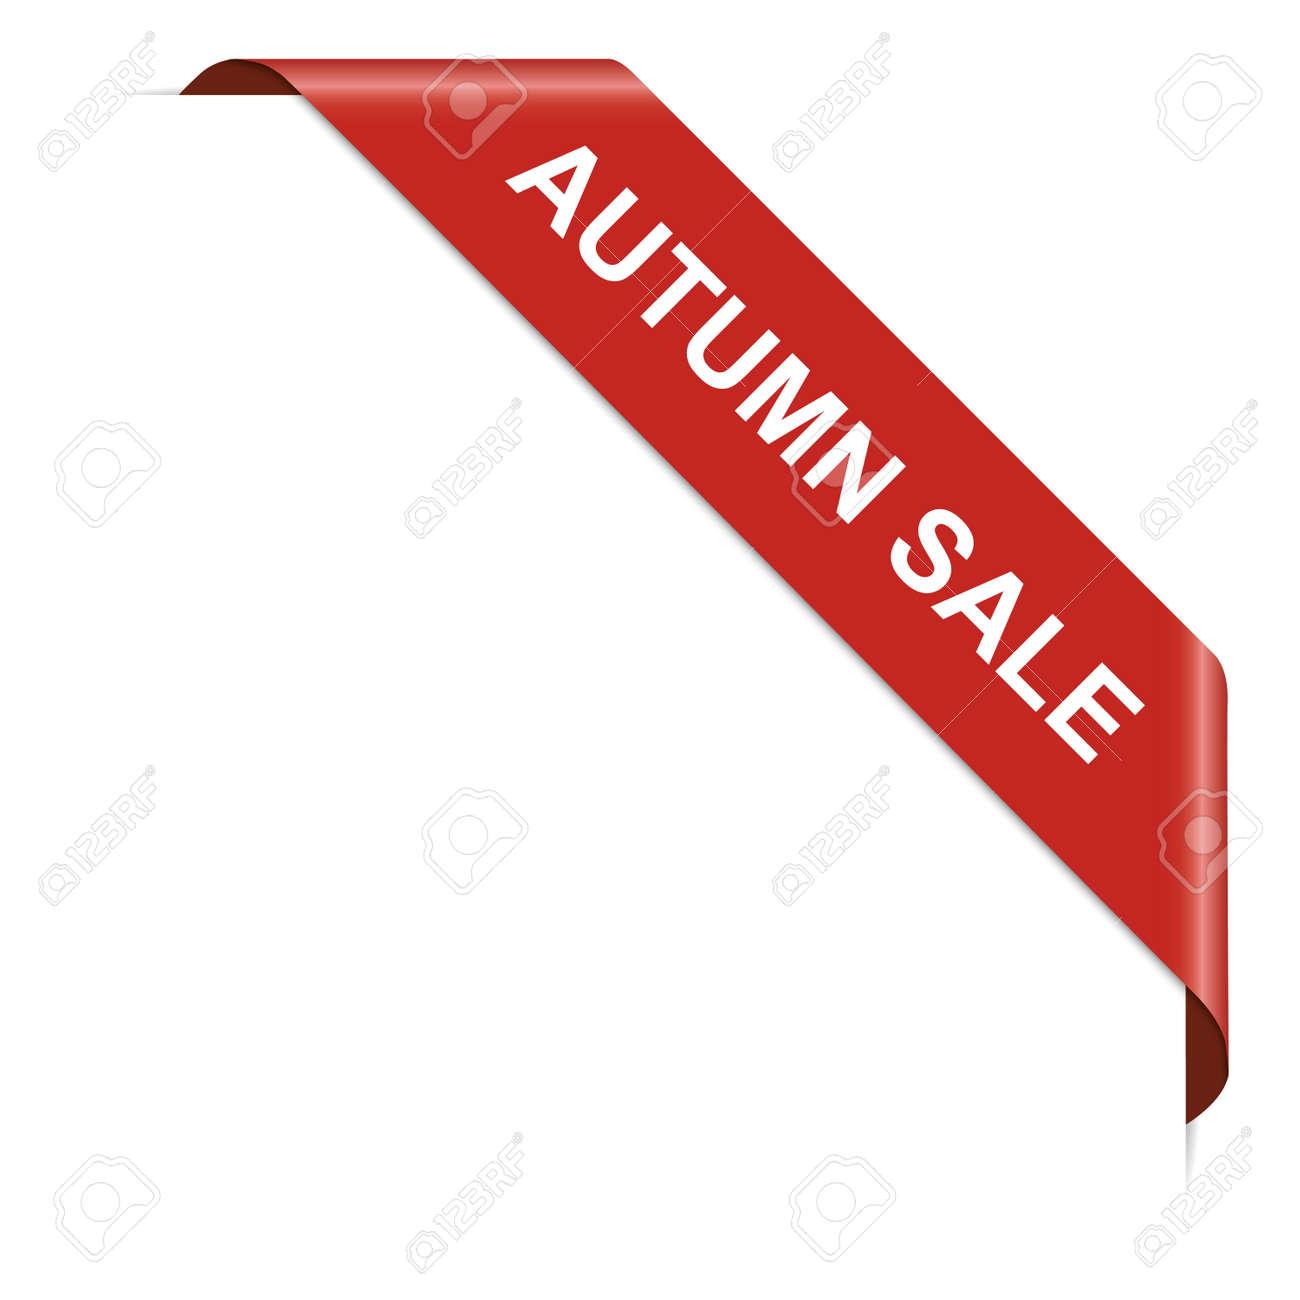 AUTUMN SALE - red corner ribbon banner on white background - 155168886